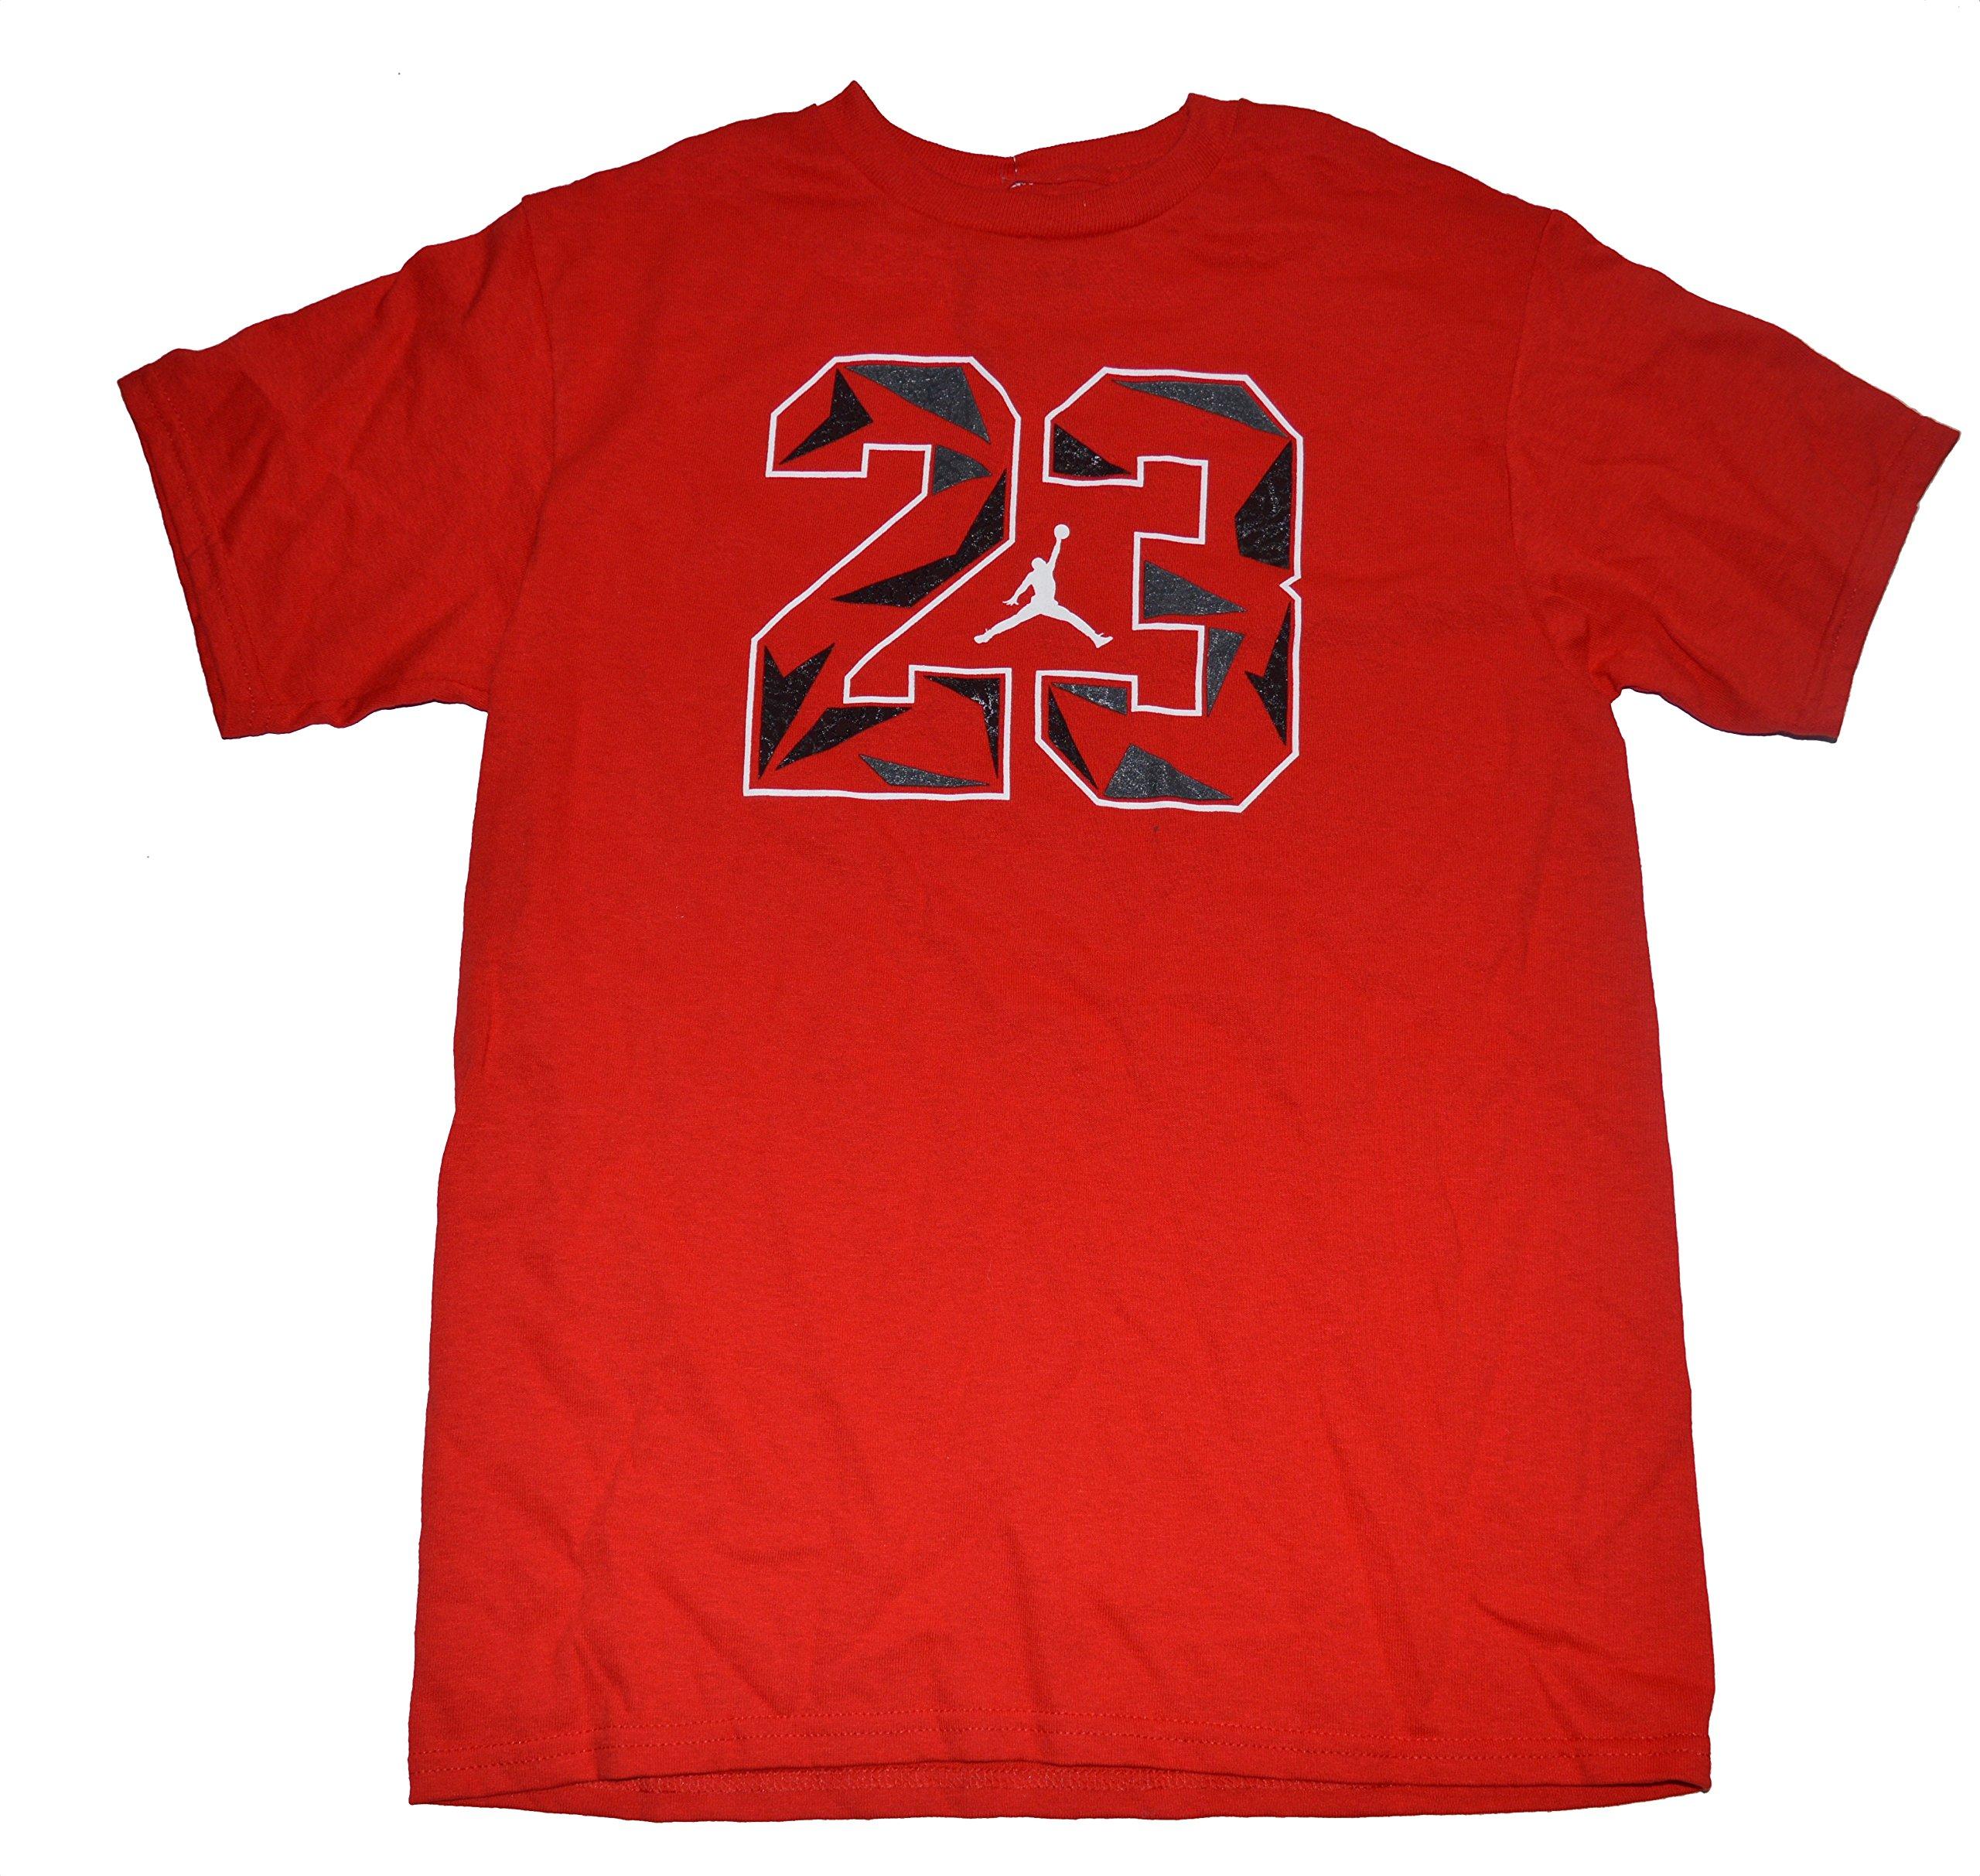 Nike Air Jordan Jumpman Big Boys Crewneck 23 Jumpman T Shirt Red Size Large